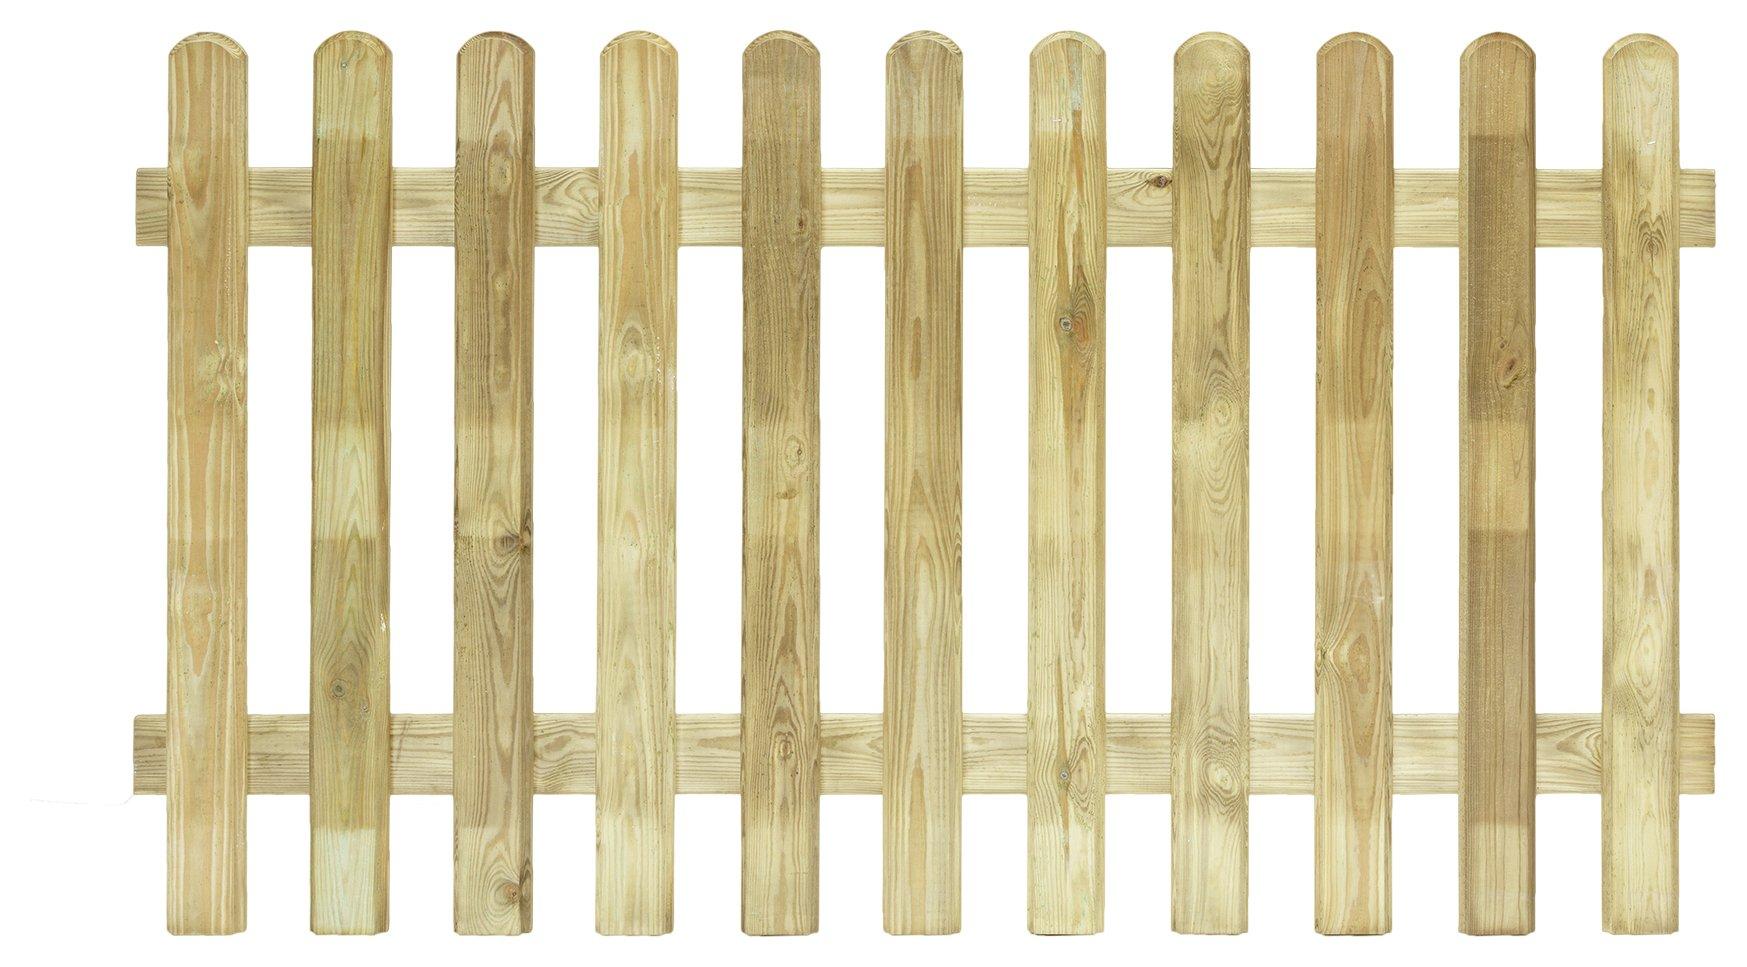 Grange Fencing Elite Profiled Picket Fence Panel - Pack of 3 lowest price